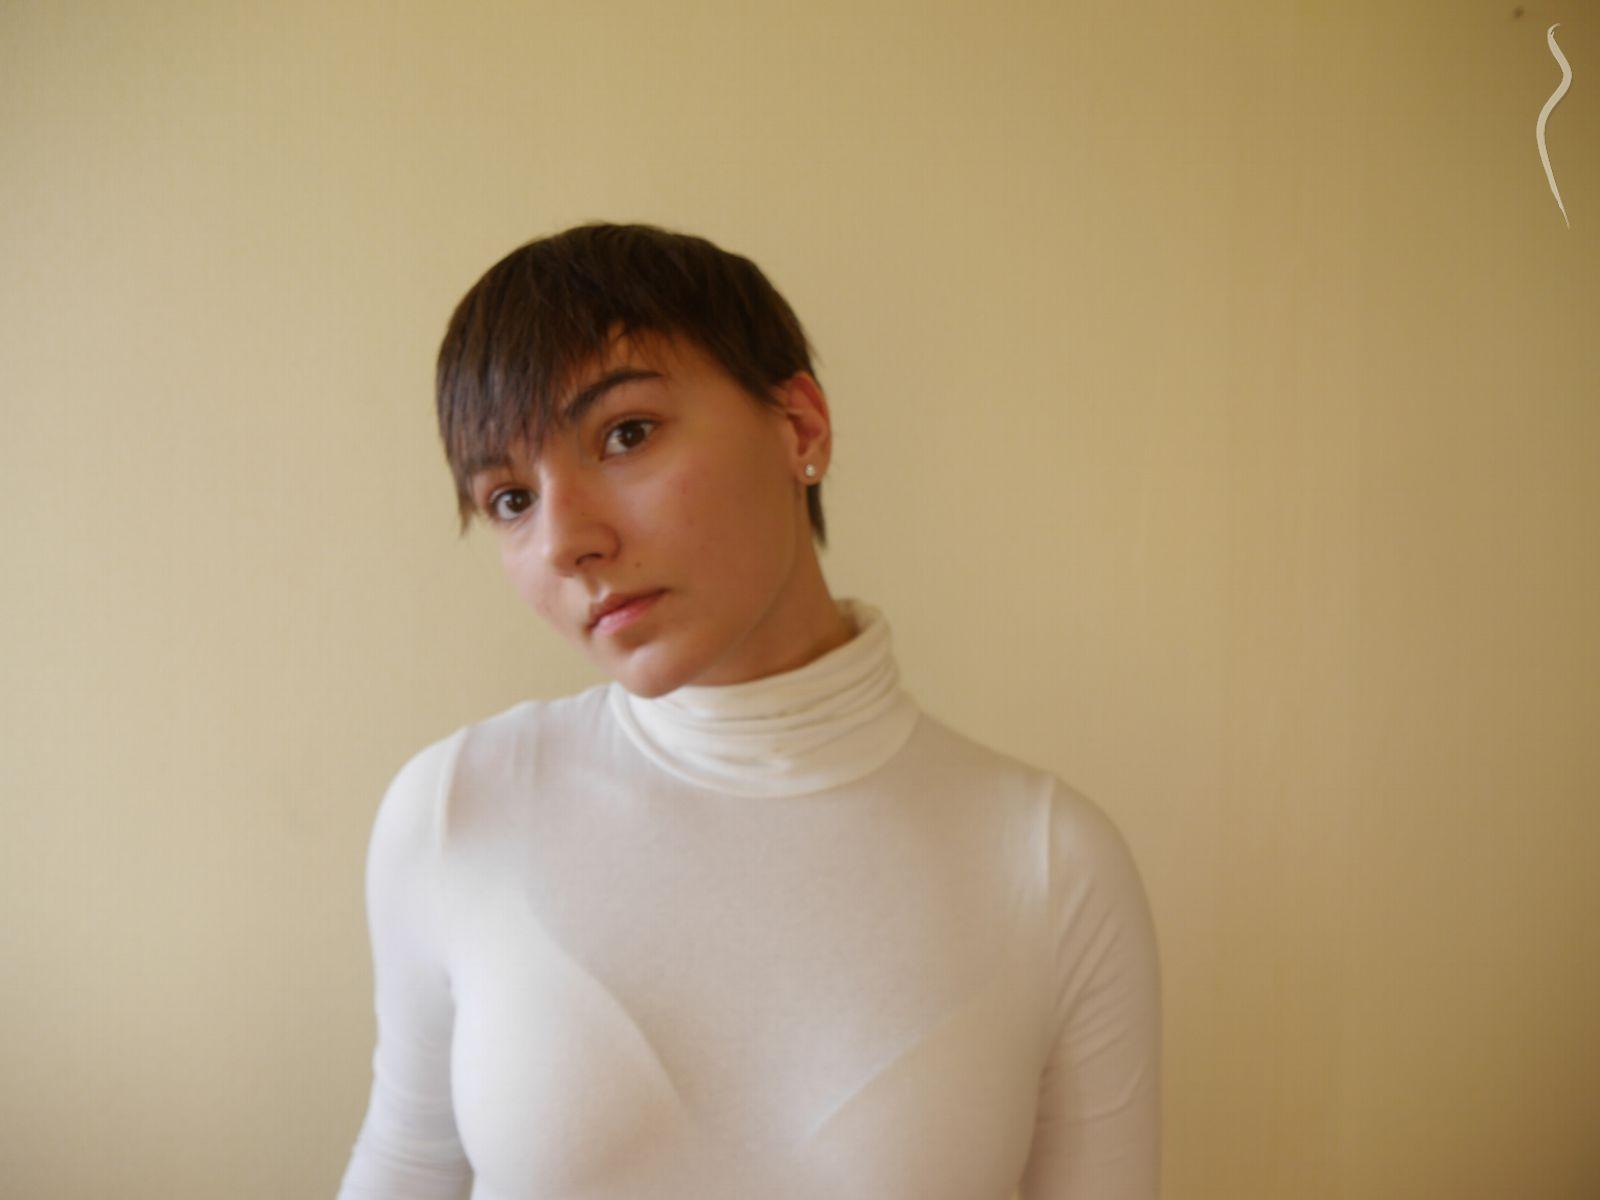 Michelle Bradshaw - a model from Germany | Model ManagementMichelle Bradshaw Facebook